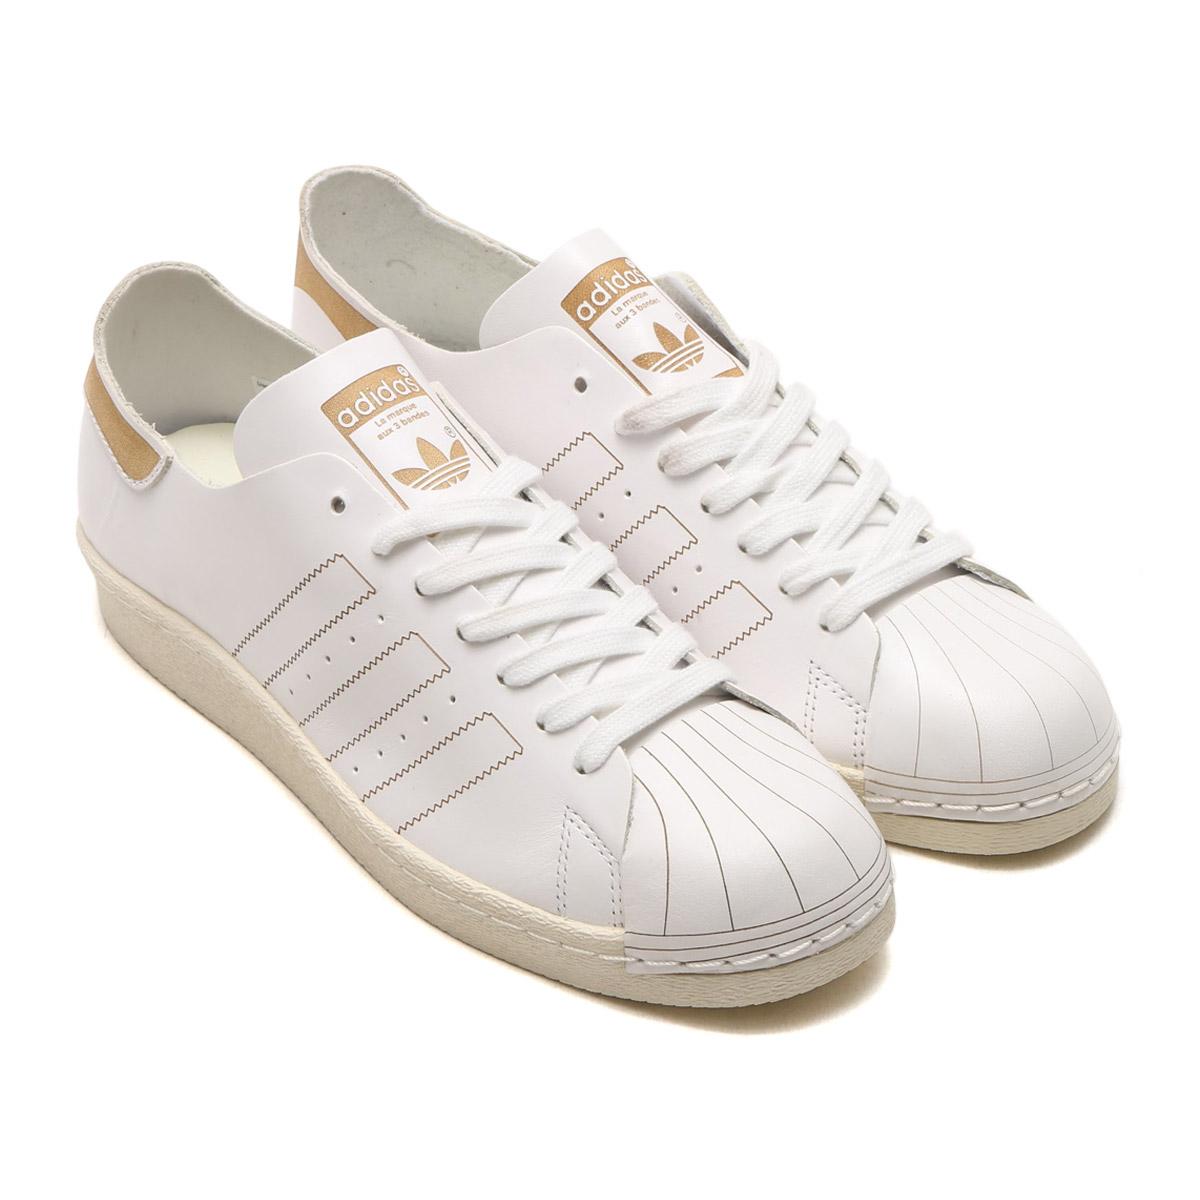 adidas Originals SUPERSTAR 80s DECON(アディダス オリジナルス スーパースター) (RUNNING WHITE/RUNNING WHITE/VINTAGE WHITE)【メンズ レディース スニーカー】17FW-S